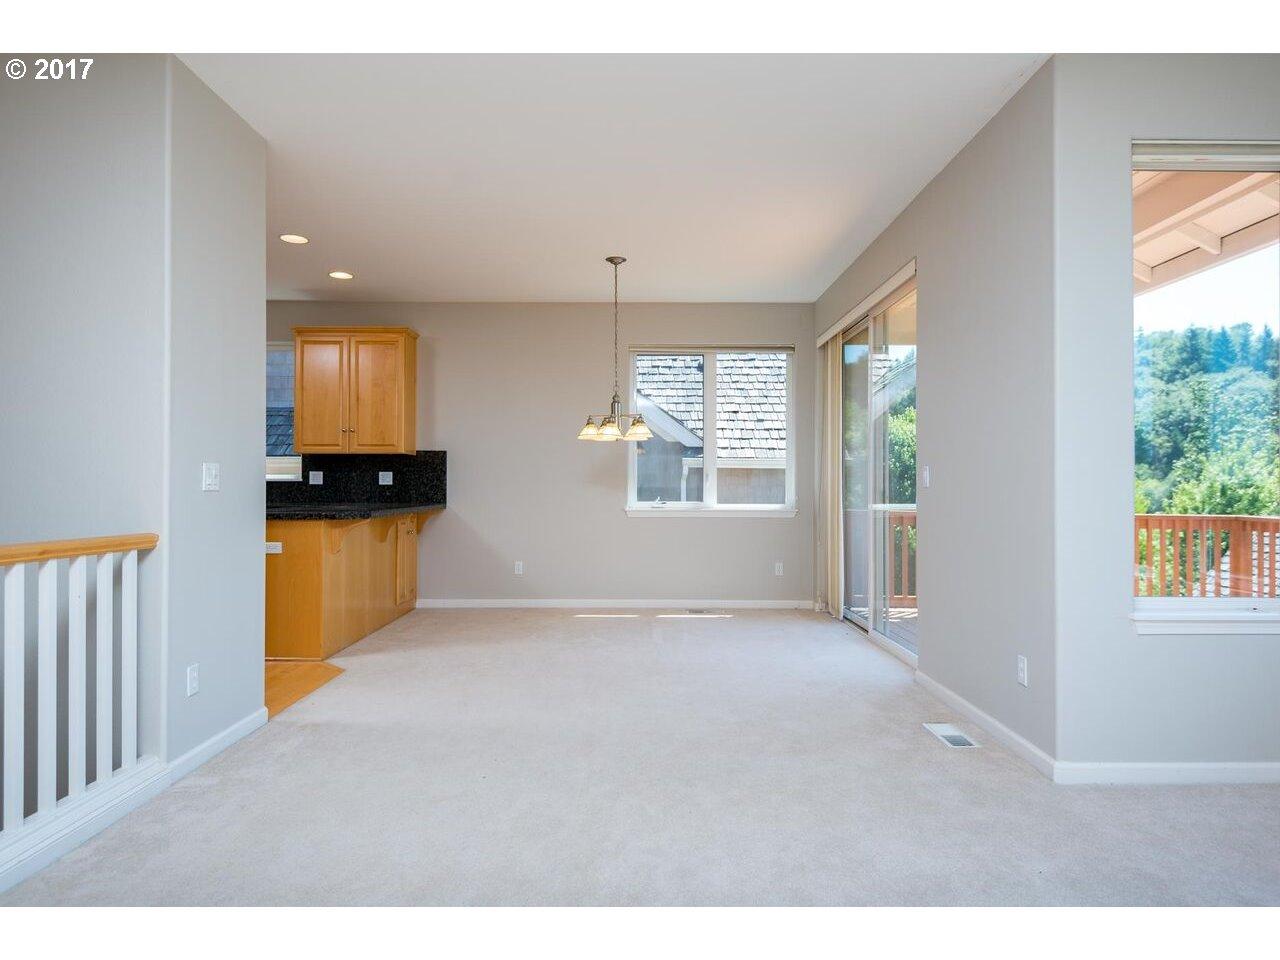 9738 NW DURRETT ST Portland, OR 97229 - MLS #: 17635225